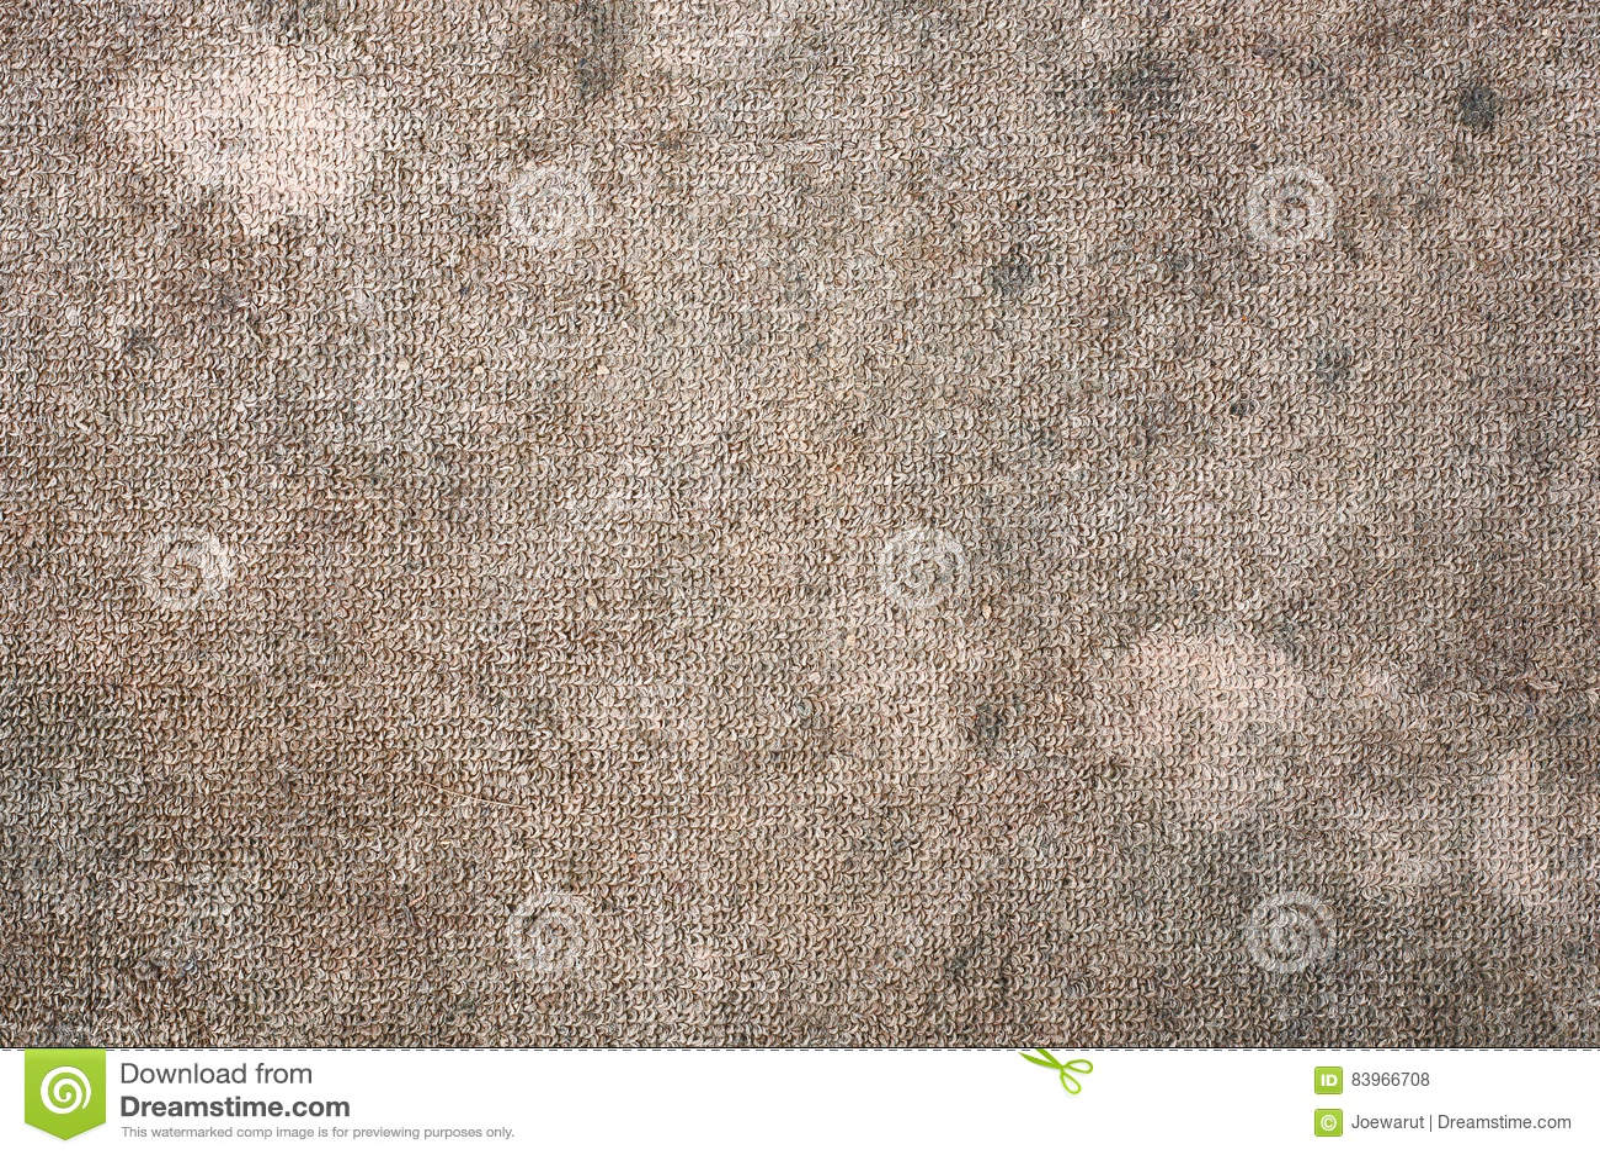 Schmutziger Teppich